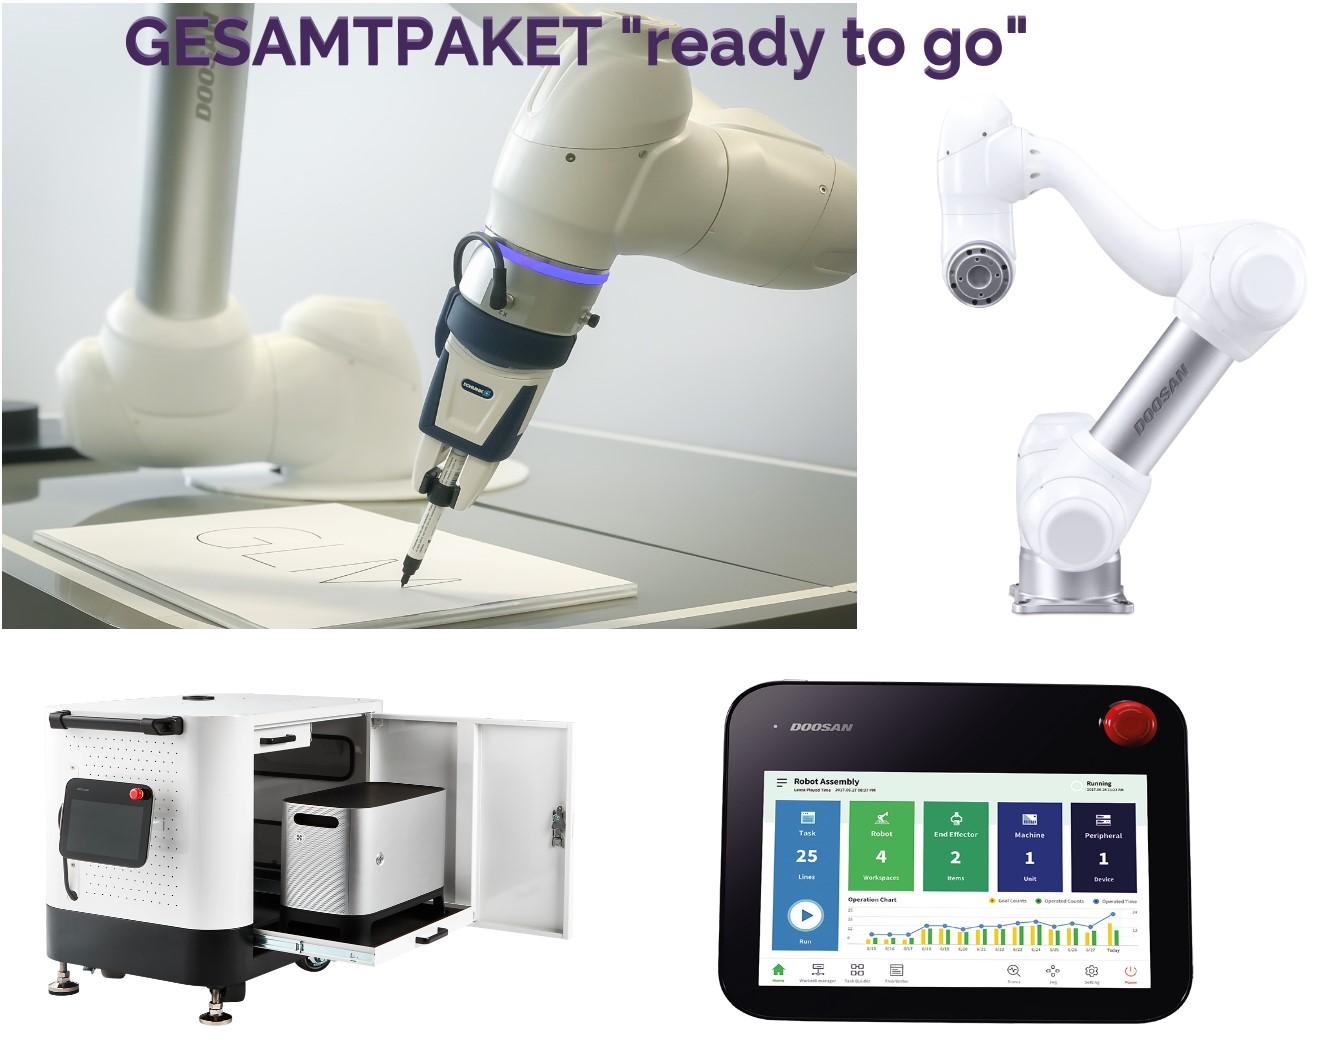 Sparpaket, Alles inklusive um gleich loszulegen. Roboterarm, Greifer, Roboterschulung, Bedienpanel, mobile Roboterbasis